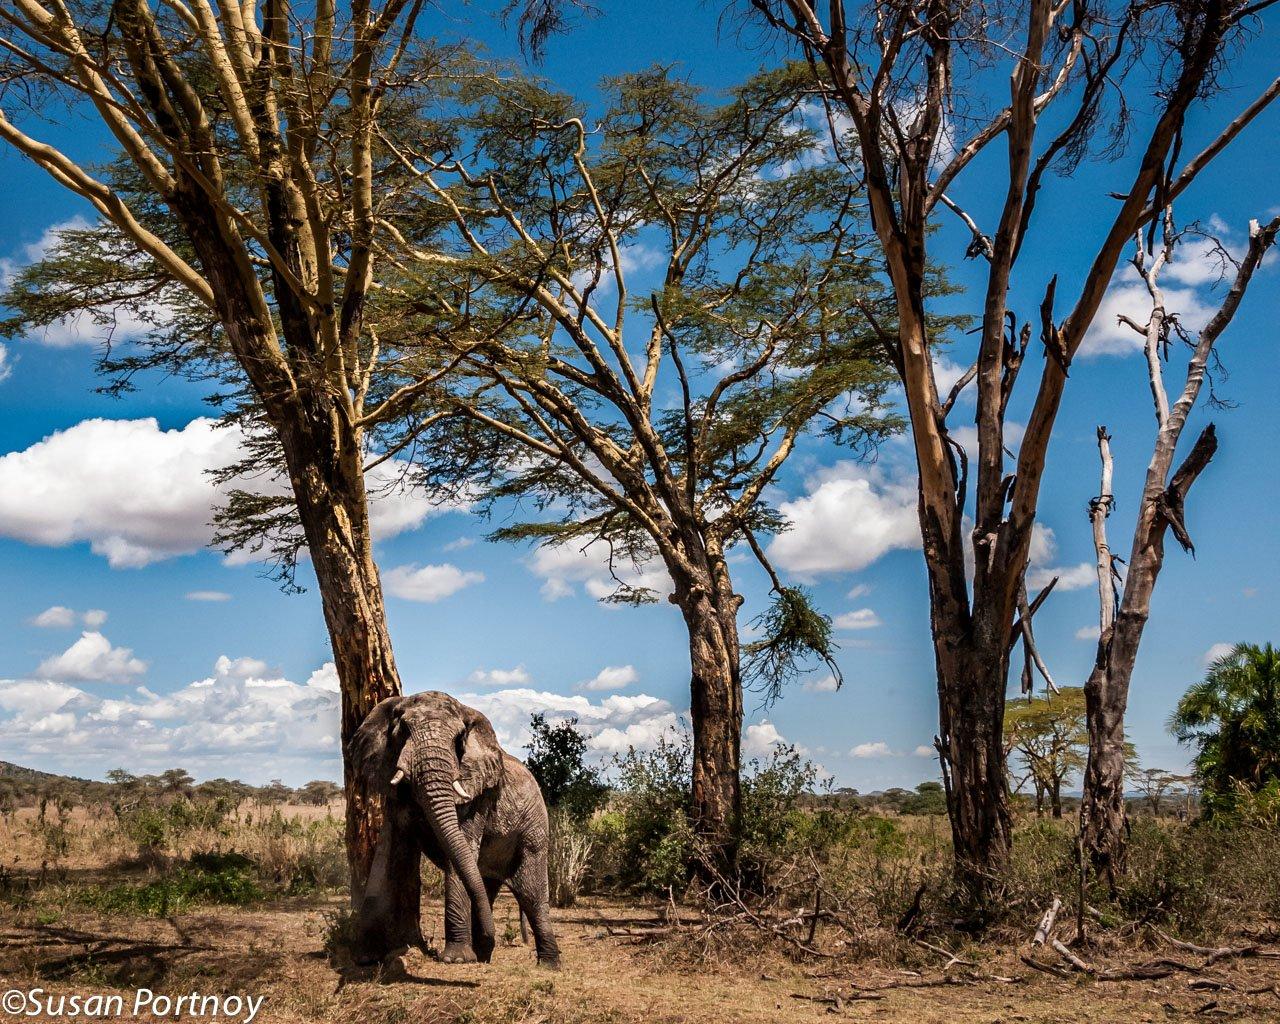 A big tree for a big elephant scratch